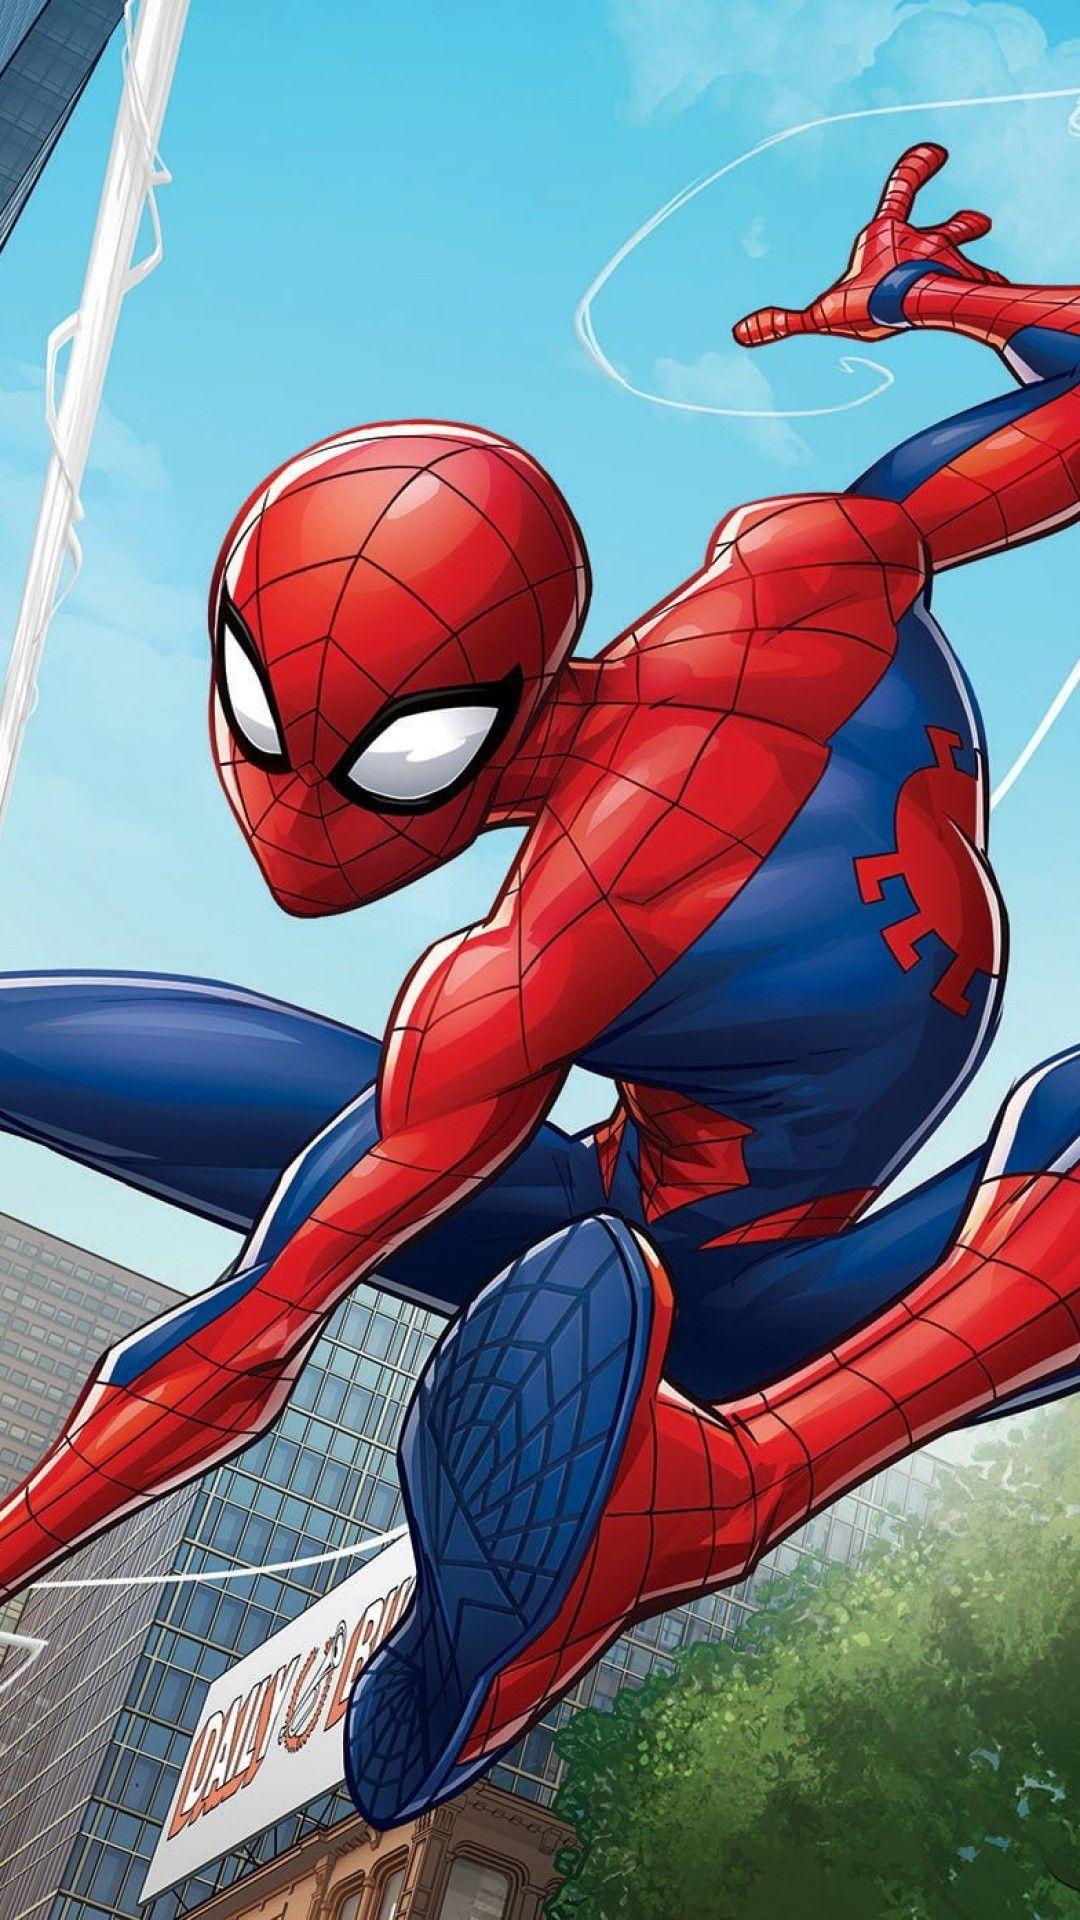 Homem Aranha Full Hd Spider Man 3 Europosters 197695 Hd